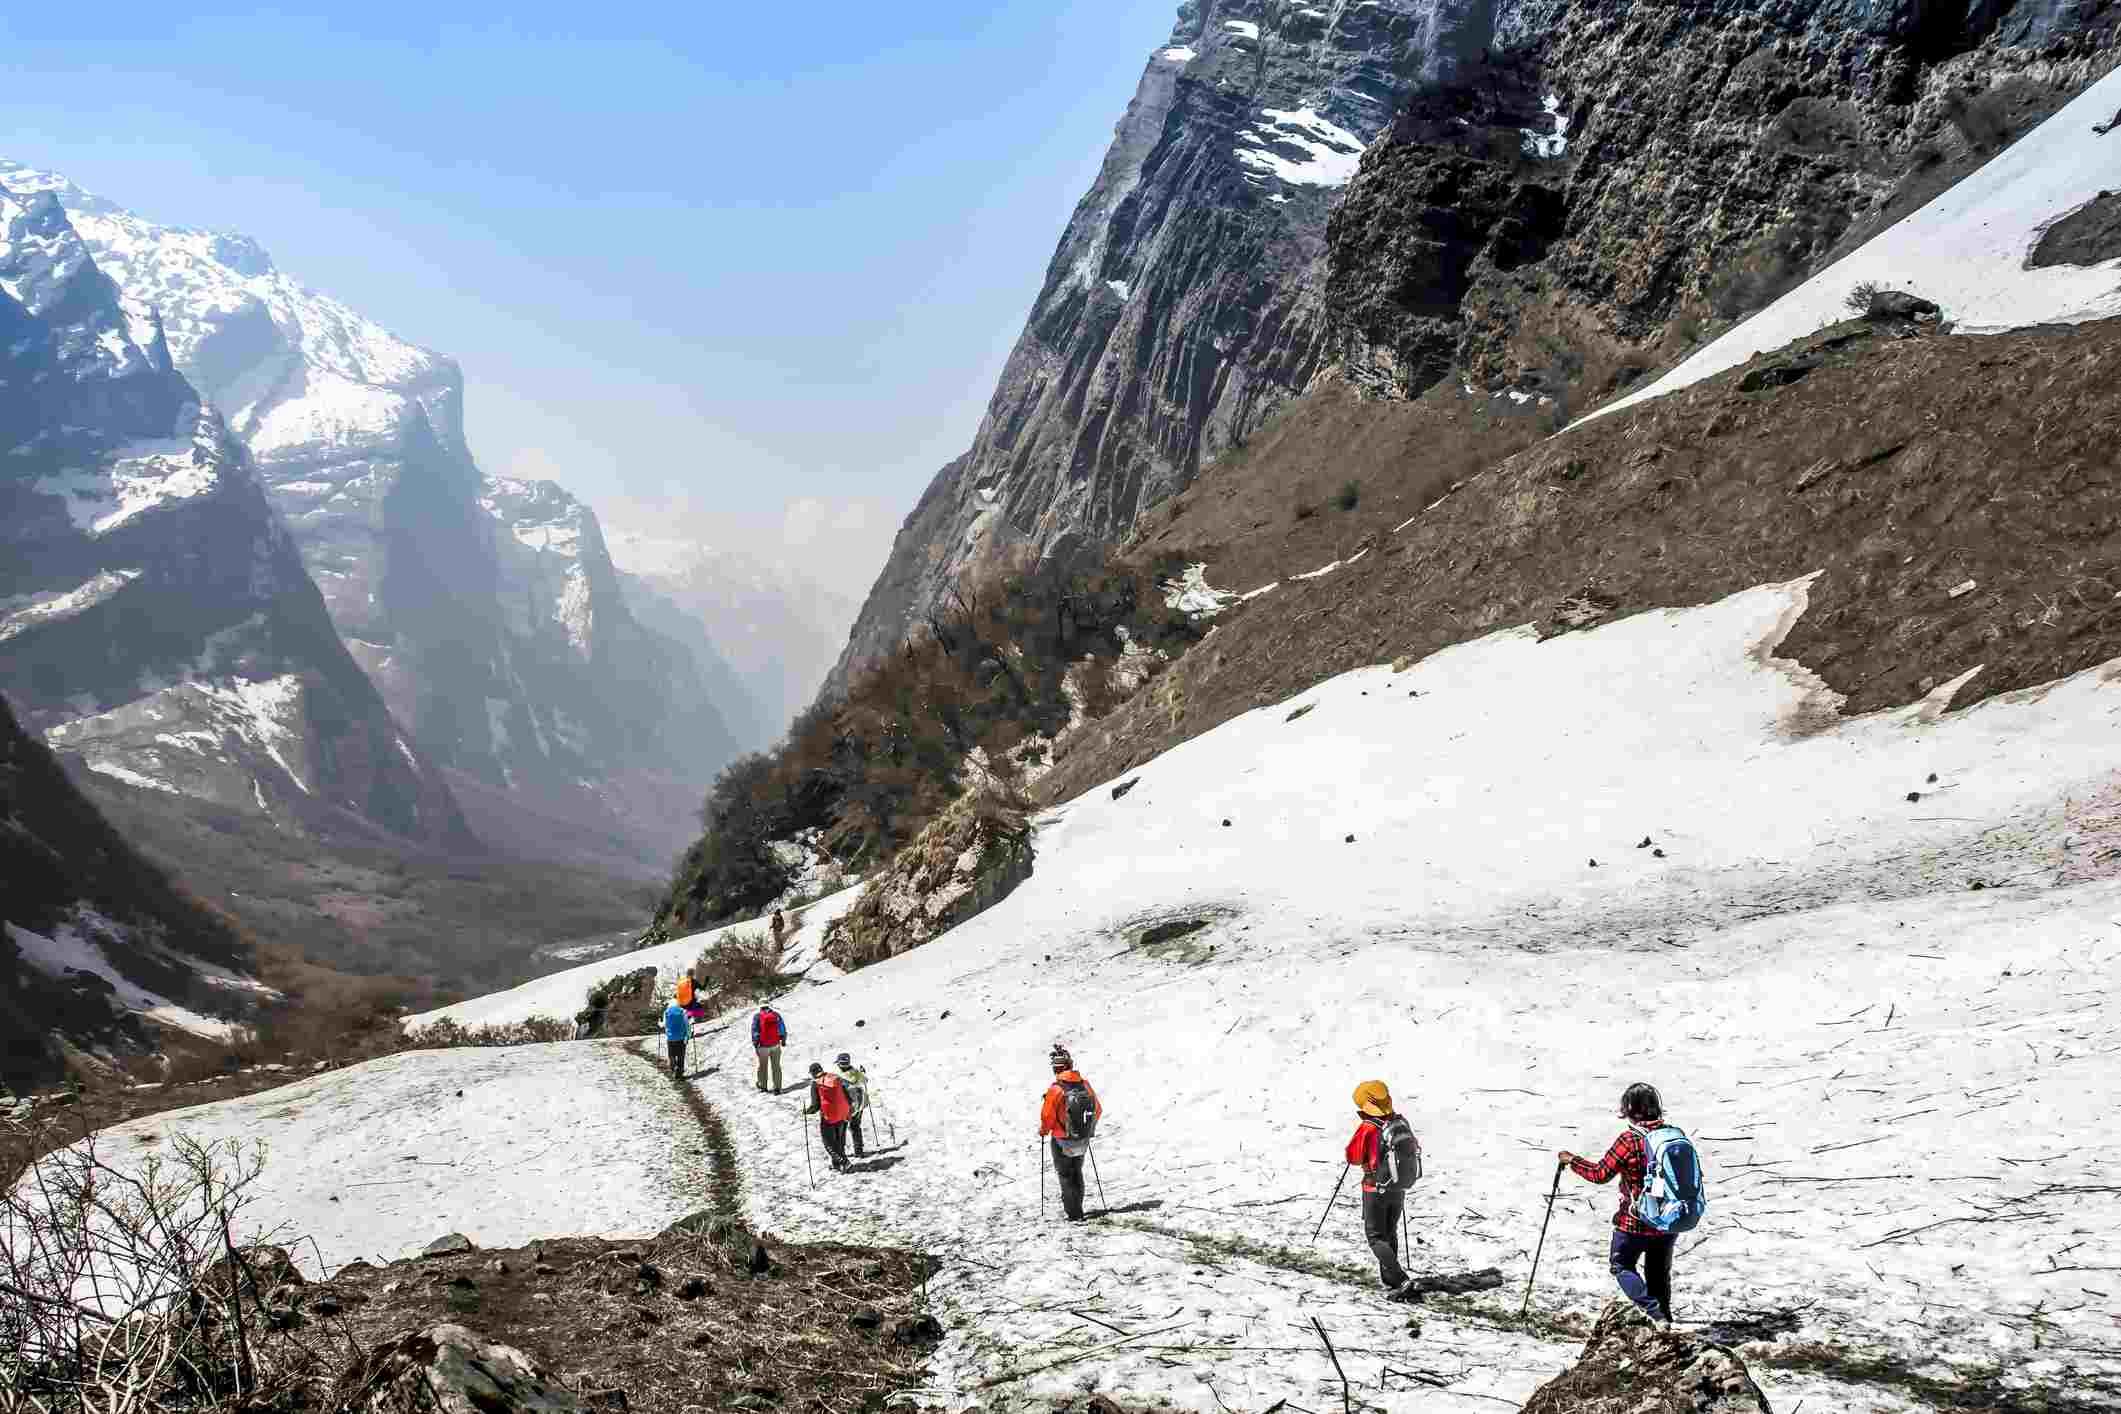 Annapurna Base Camp Trekking: trekkers were walking down from base camp.